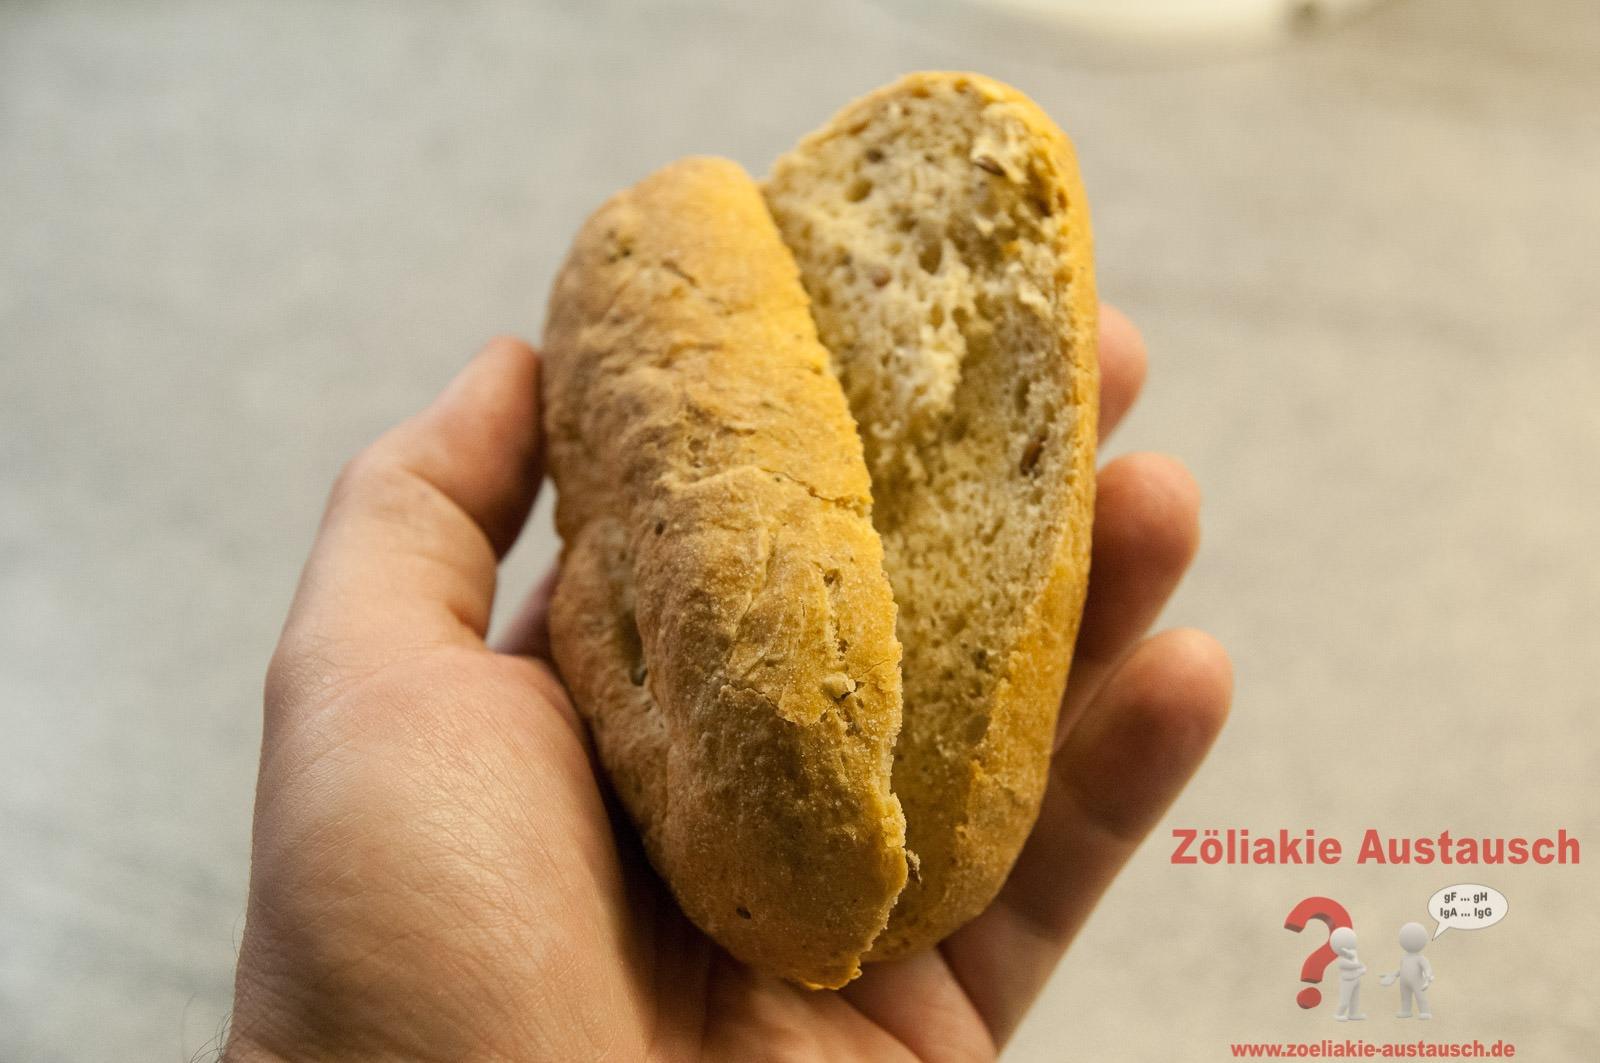 Zoeliakie_Austausch_BoFrost-021